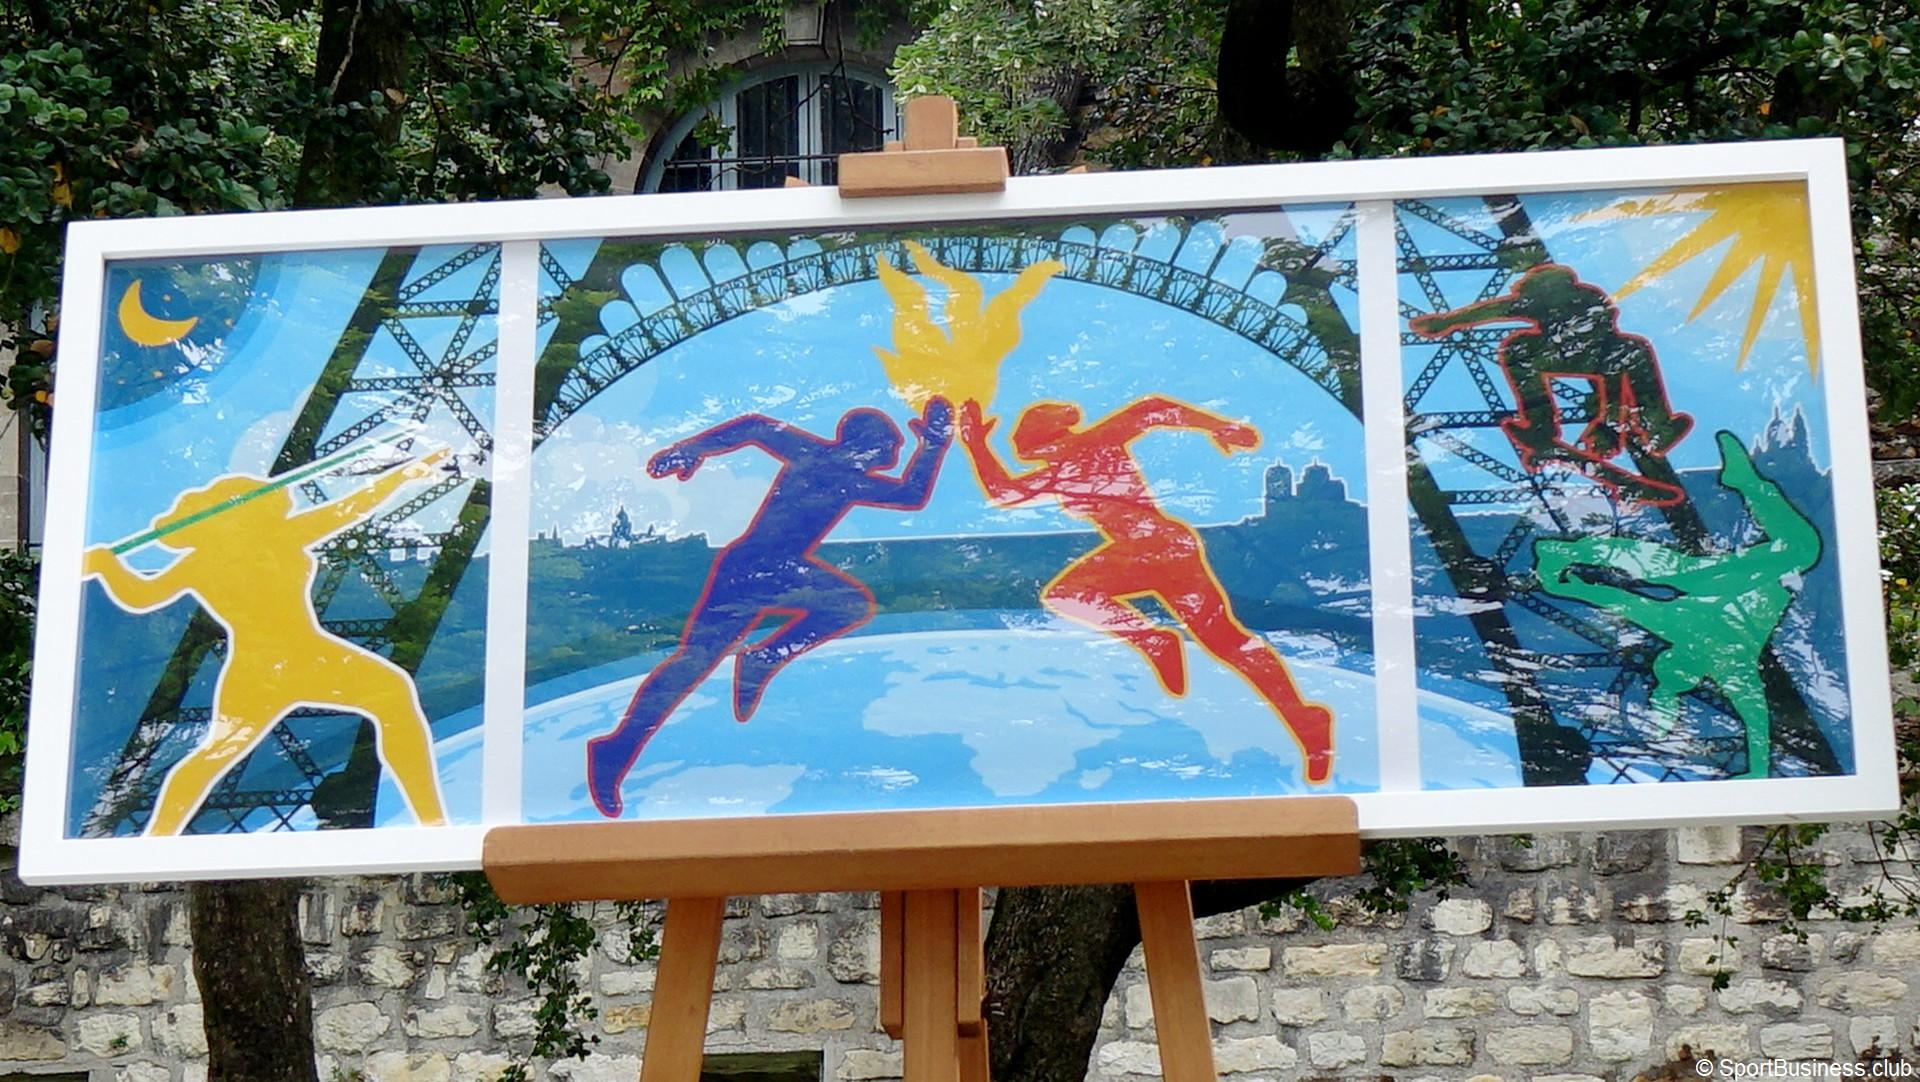 Olympiade culturelle Paris 2024 (2) Gobelins